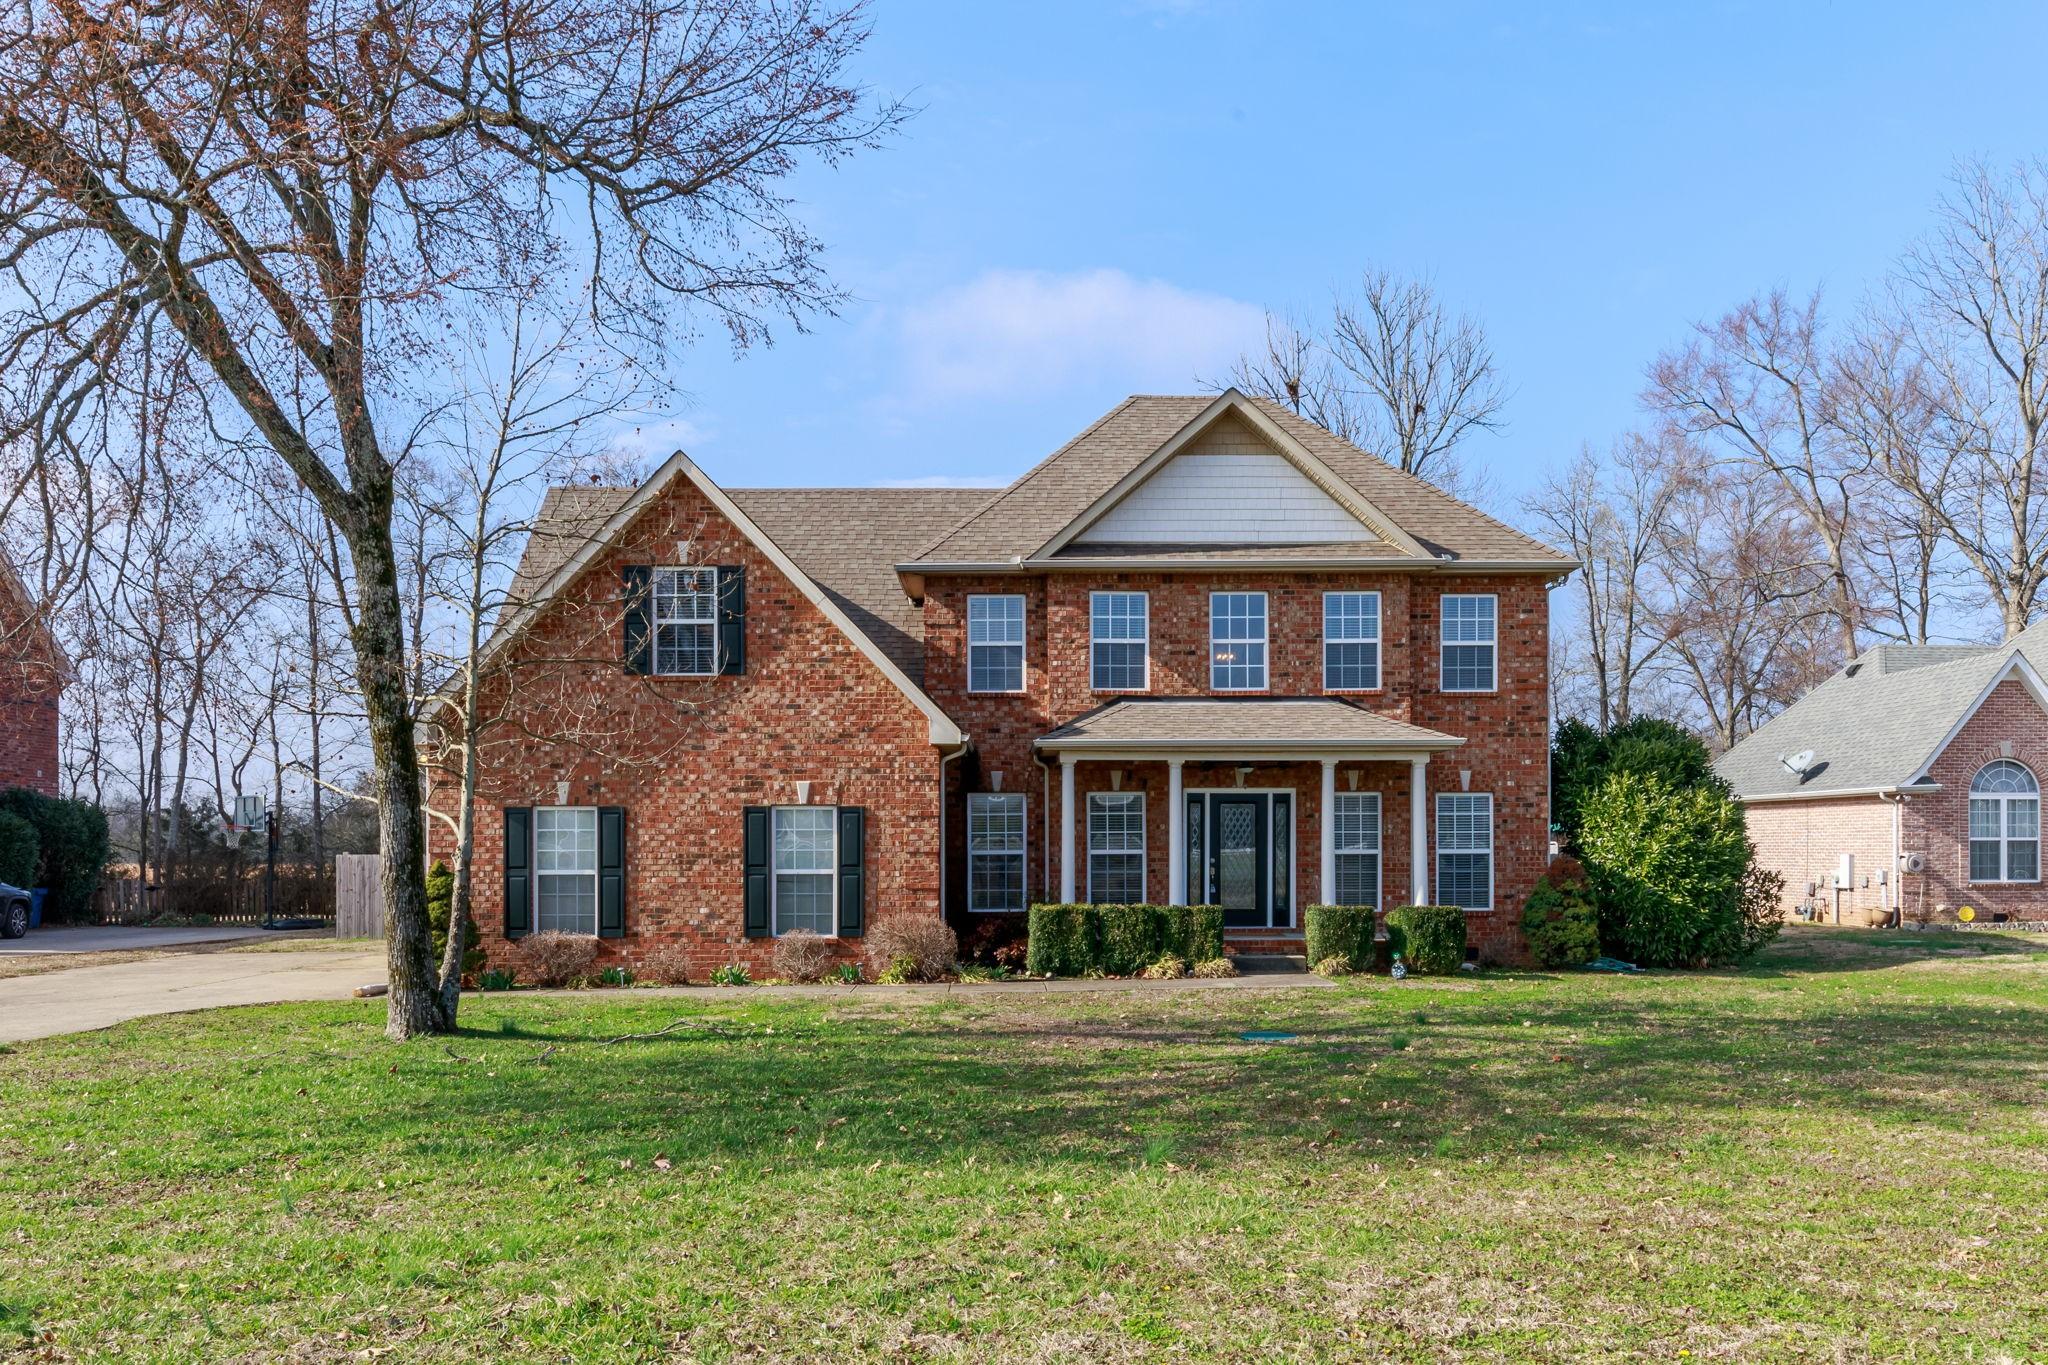 112 Annadel Ct, Murfreesboro, TN 37128 - Murfreesboro, TN real estate listing